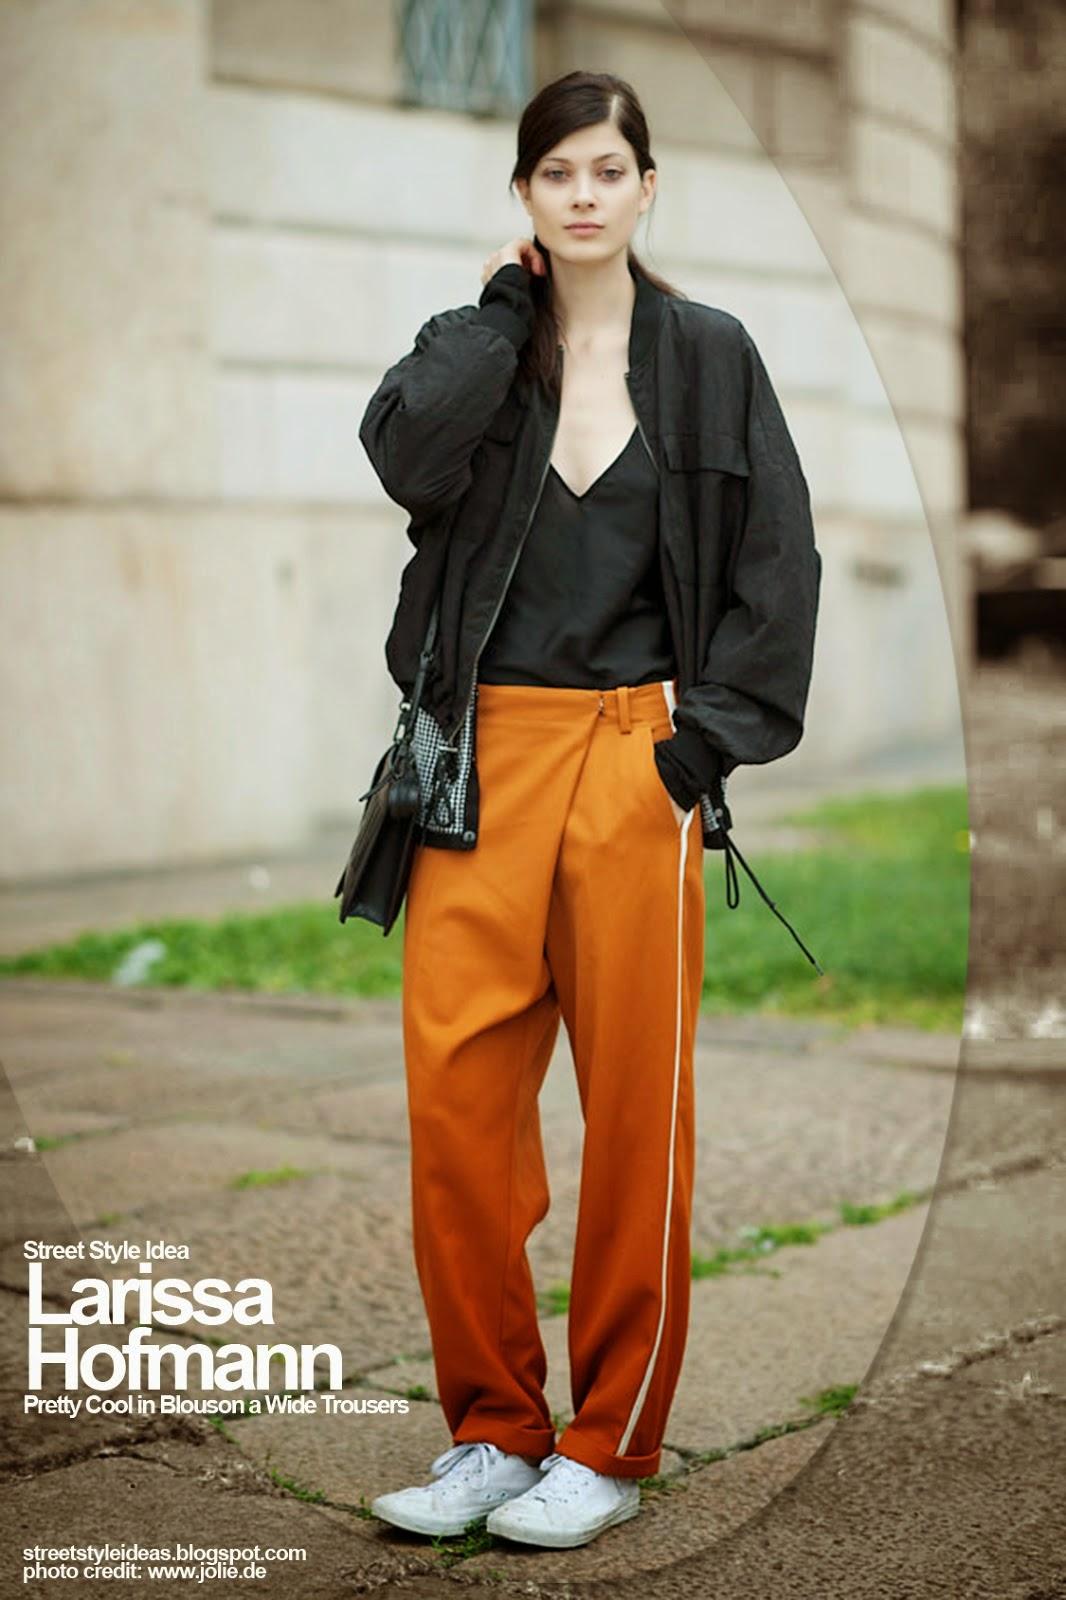 Celebrity Larissa Hofmann